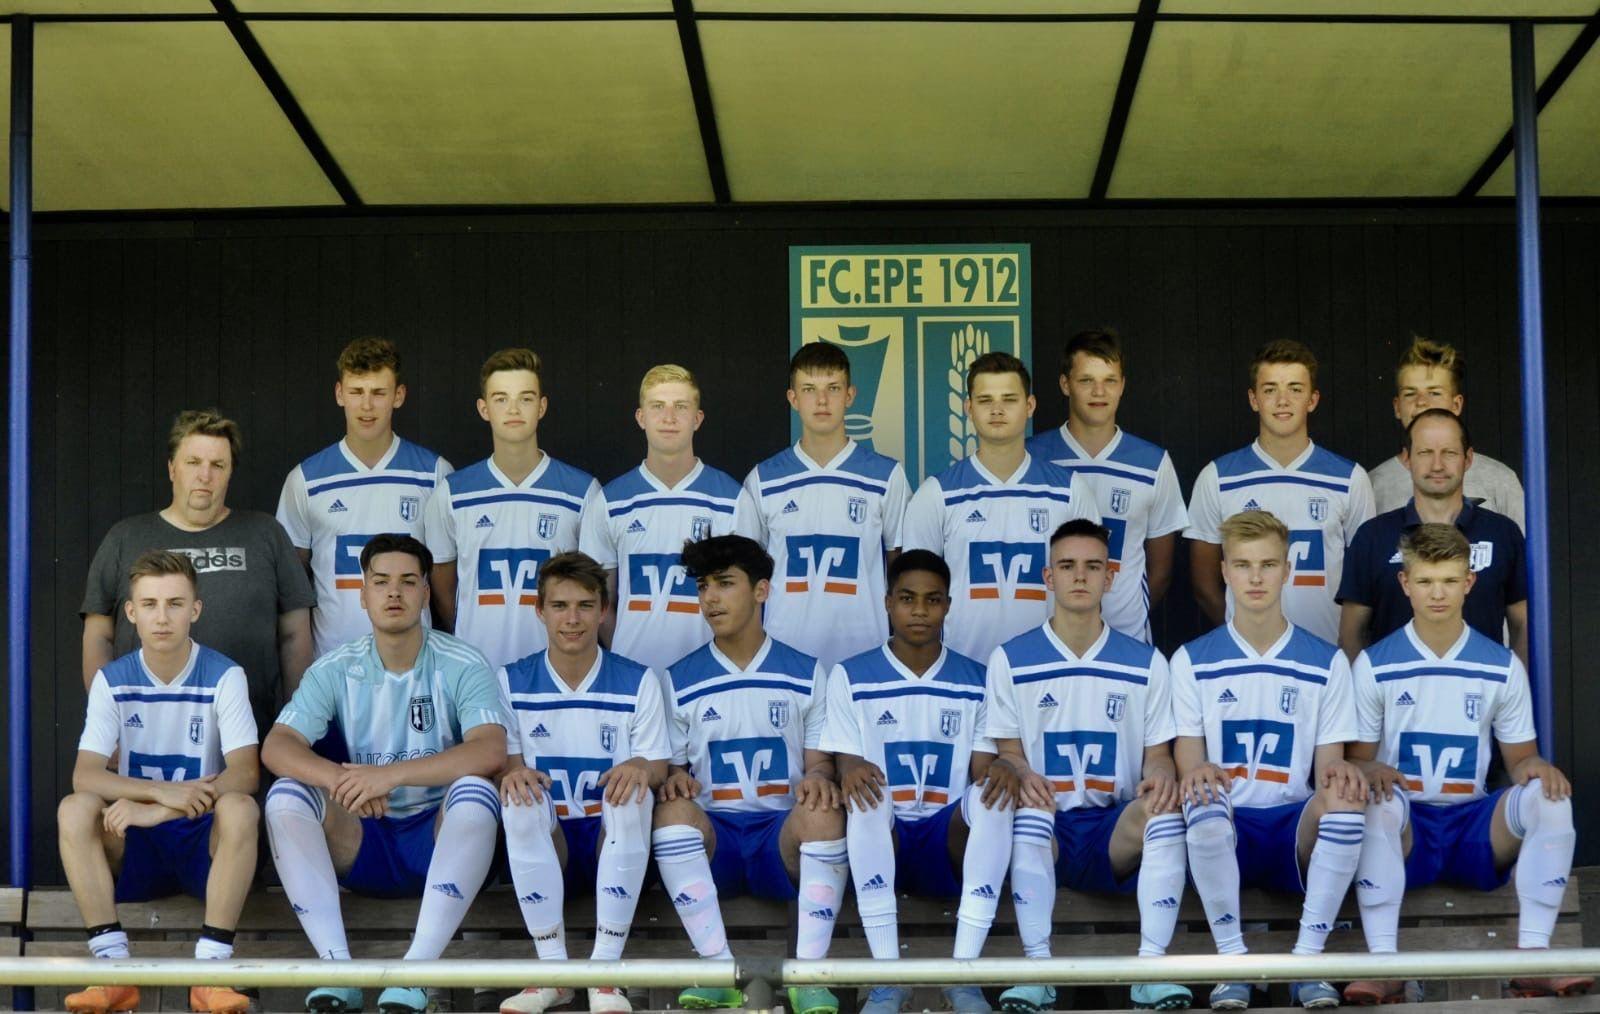 Jugendabteilung - Junioren | FC Epe 1912 e.V.